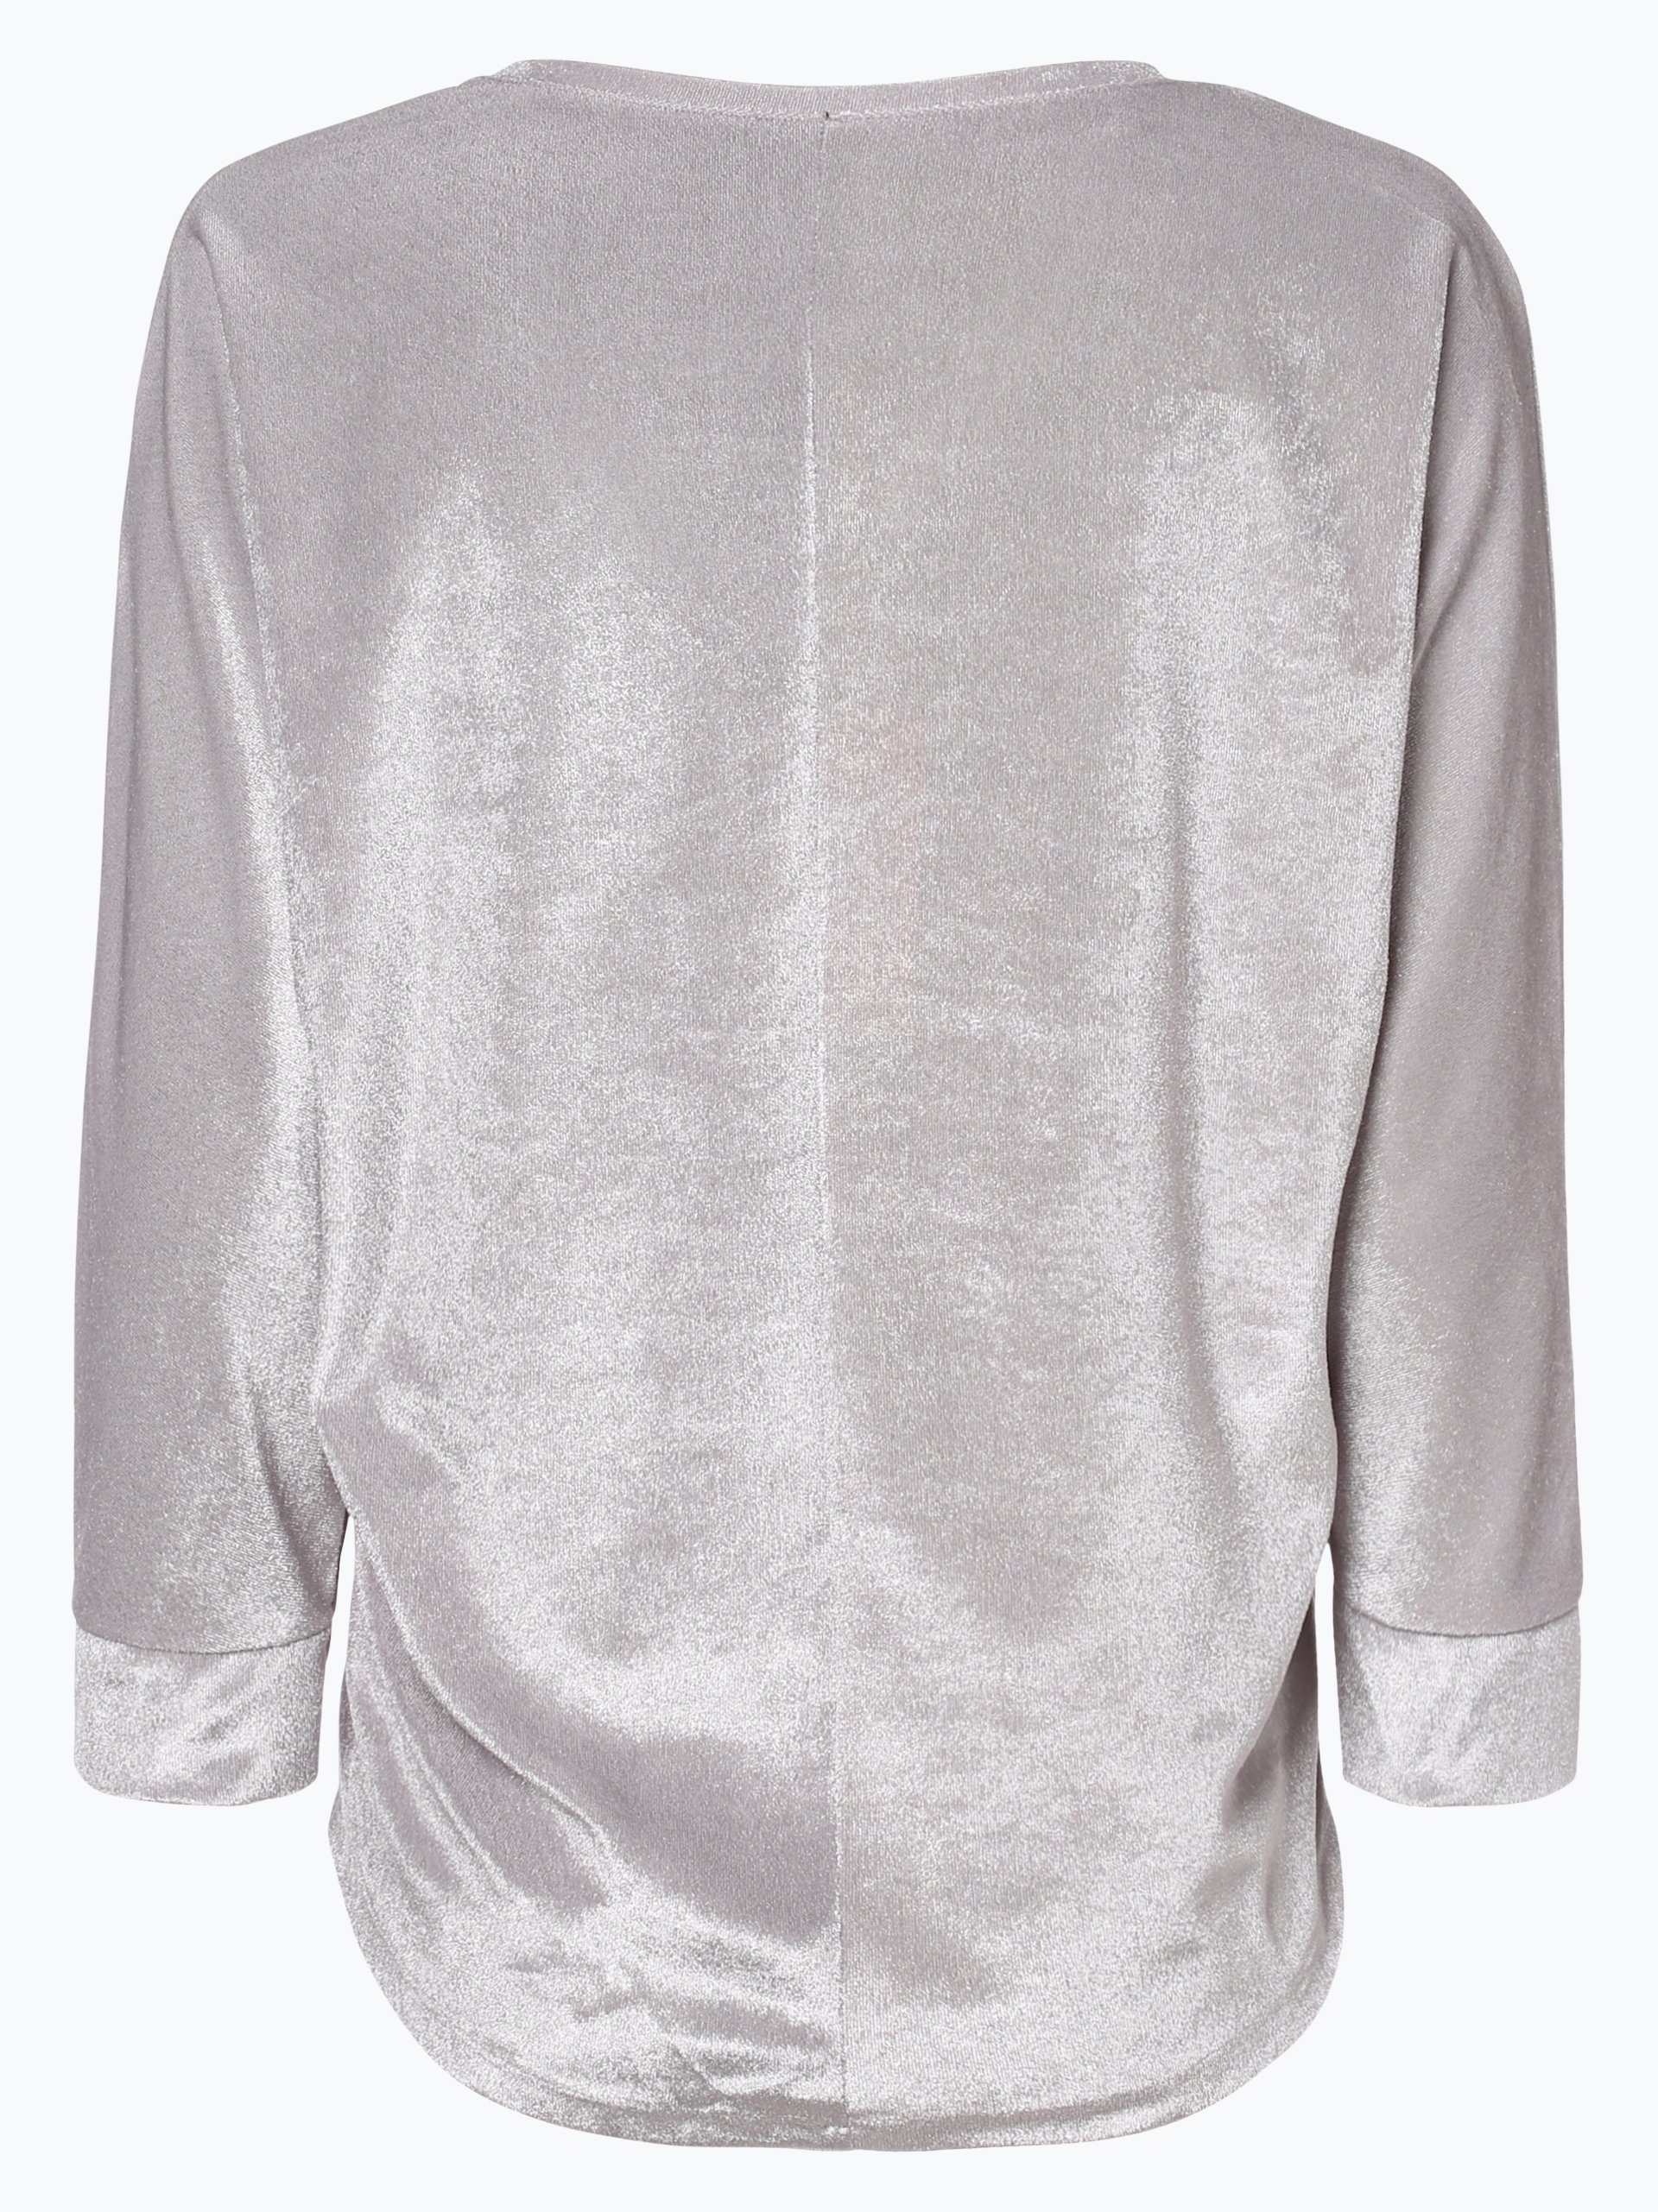 key largo damen shirt silber gemustert online kaufen vangraaf com. Black Bedroom Furniture Sets. Home Design Ideas